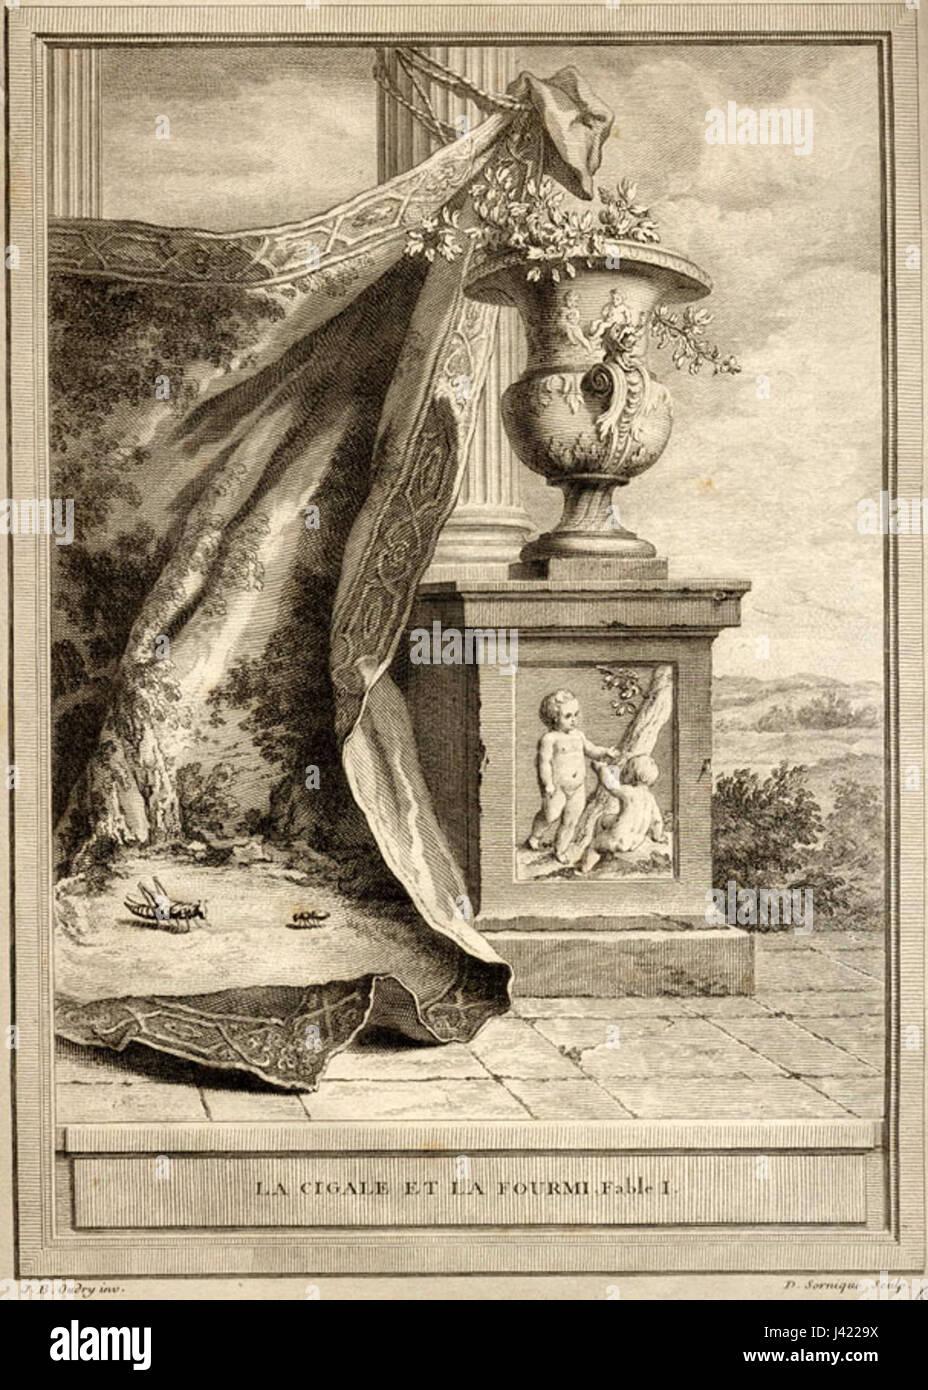 Illustration La Cigale Et La Fourmi : illustration, cigale, fourmi, Cigale, Fourmi, Stock, Photo, Alamy